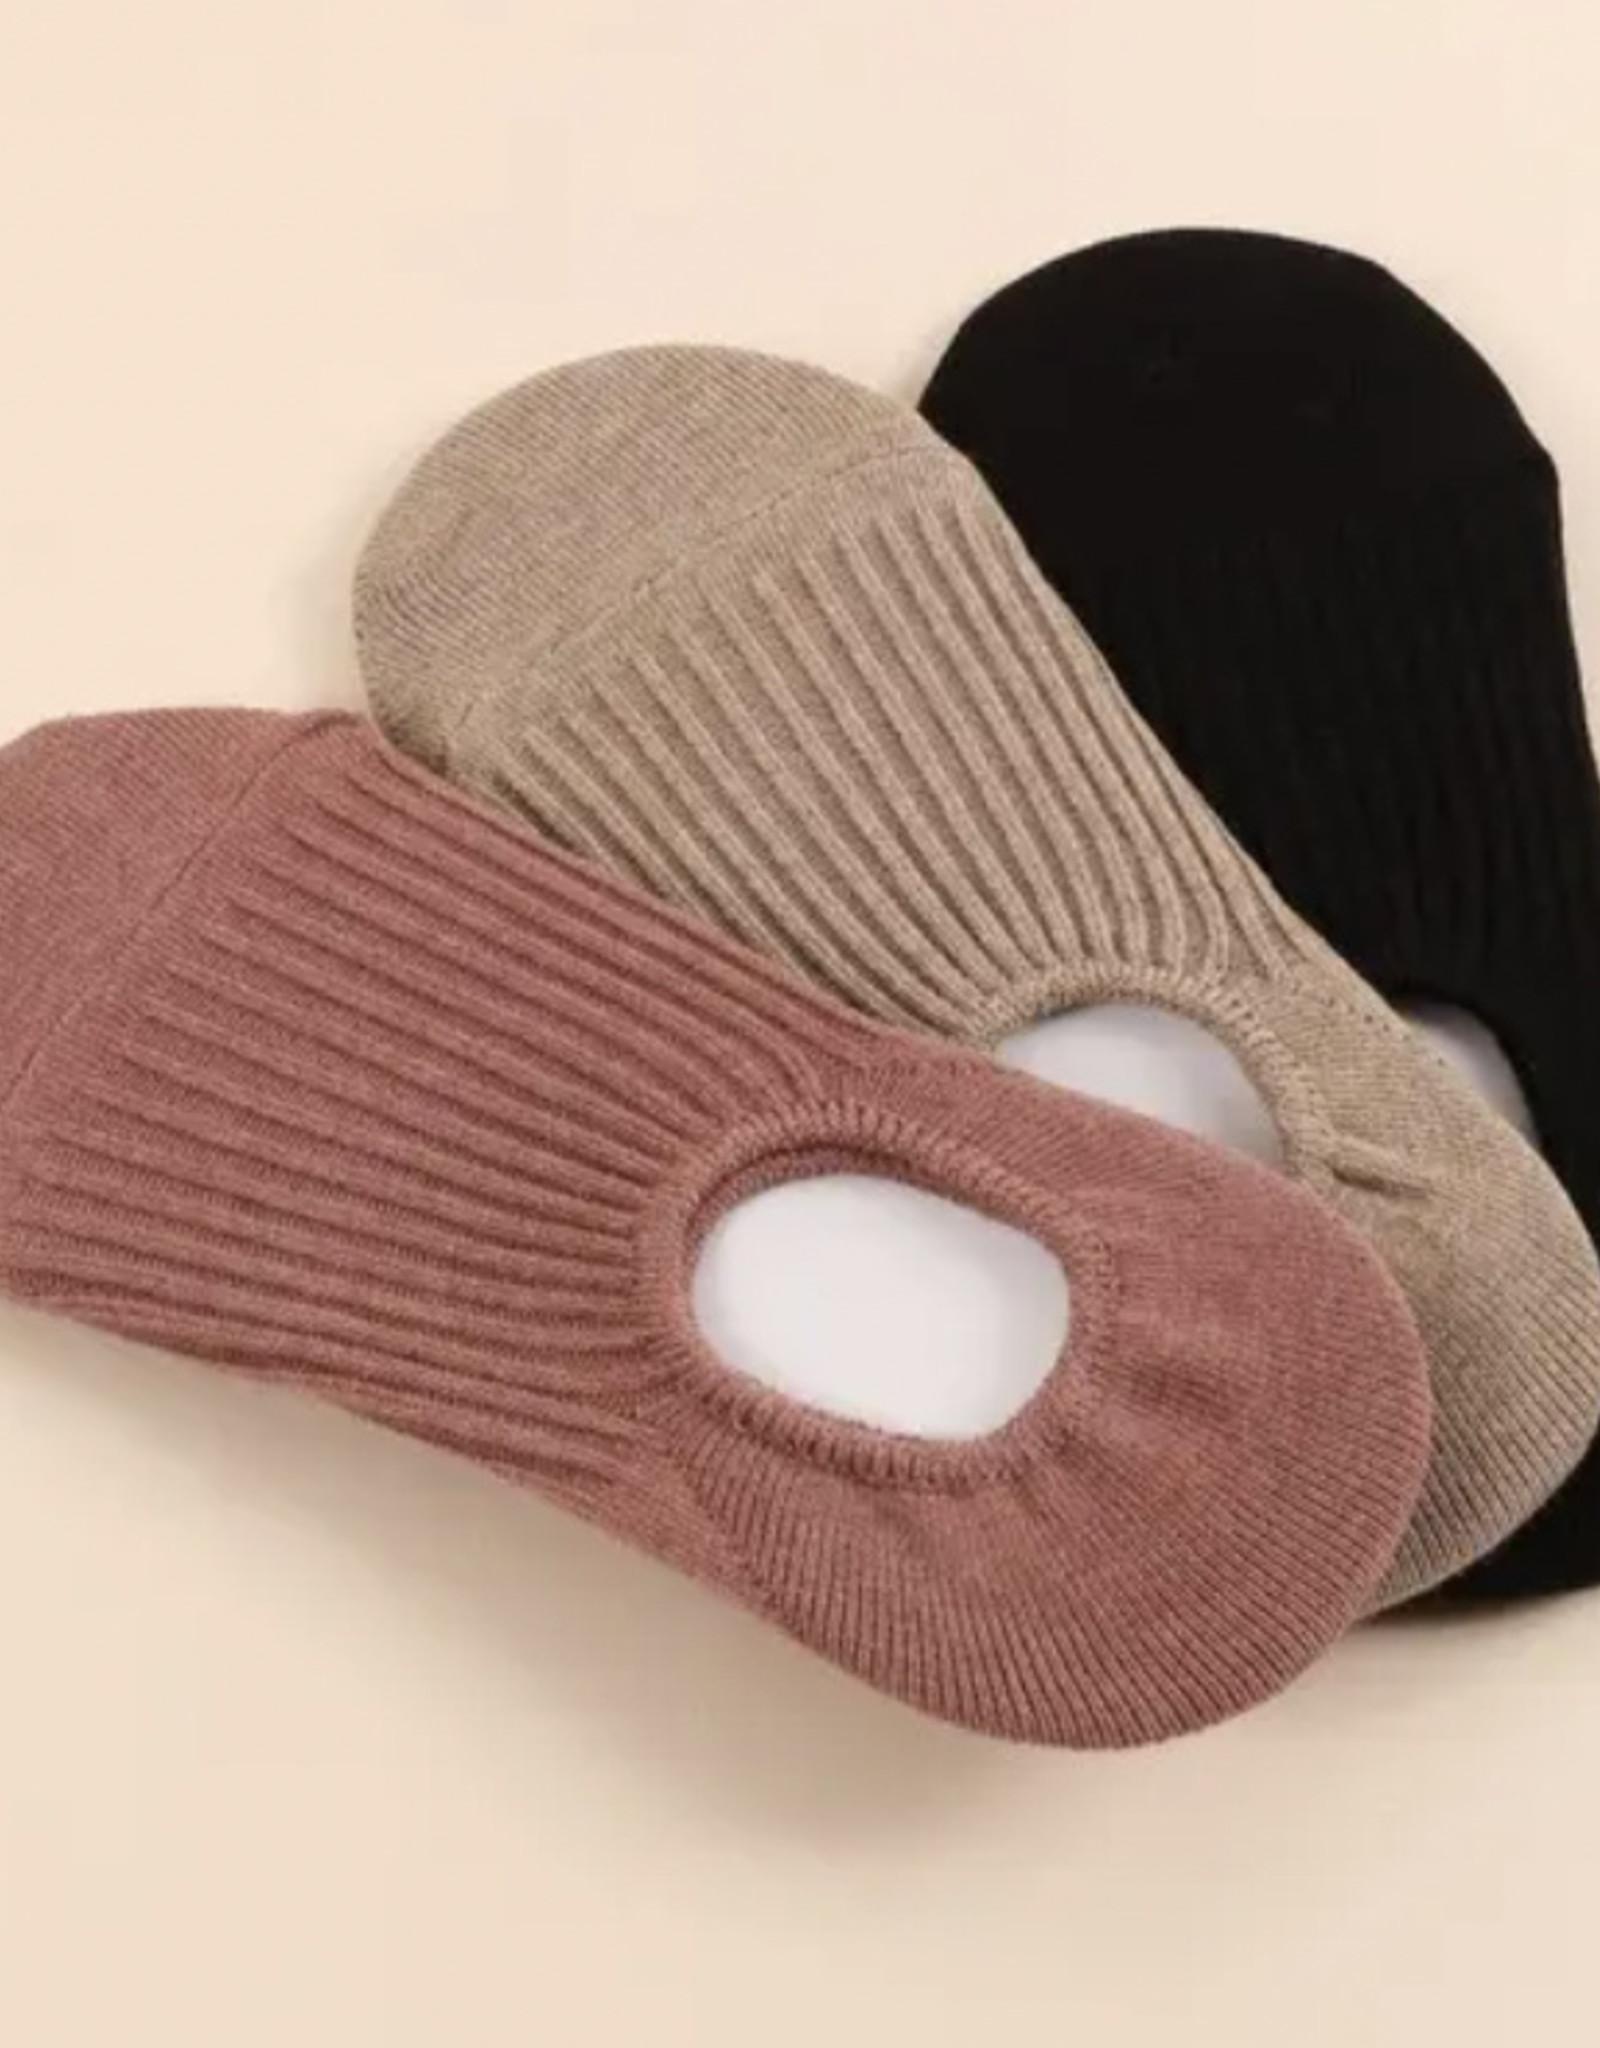 3 Pair Assorted Pack Ribbed Crew Socks